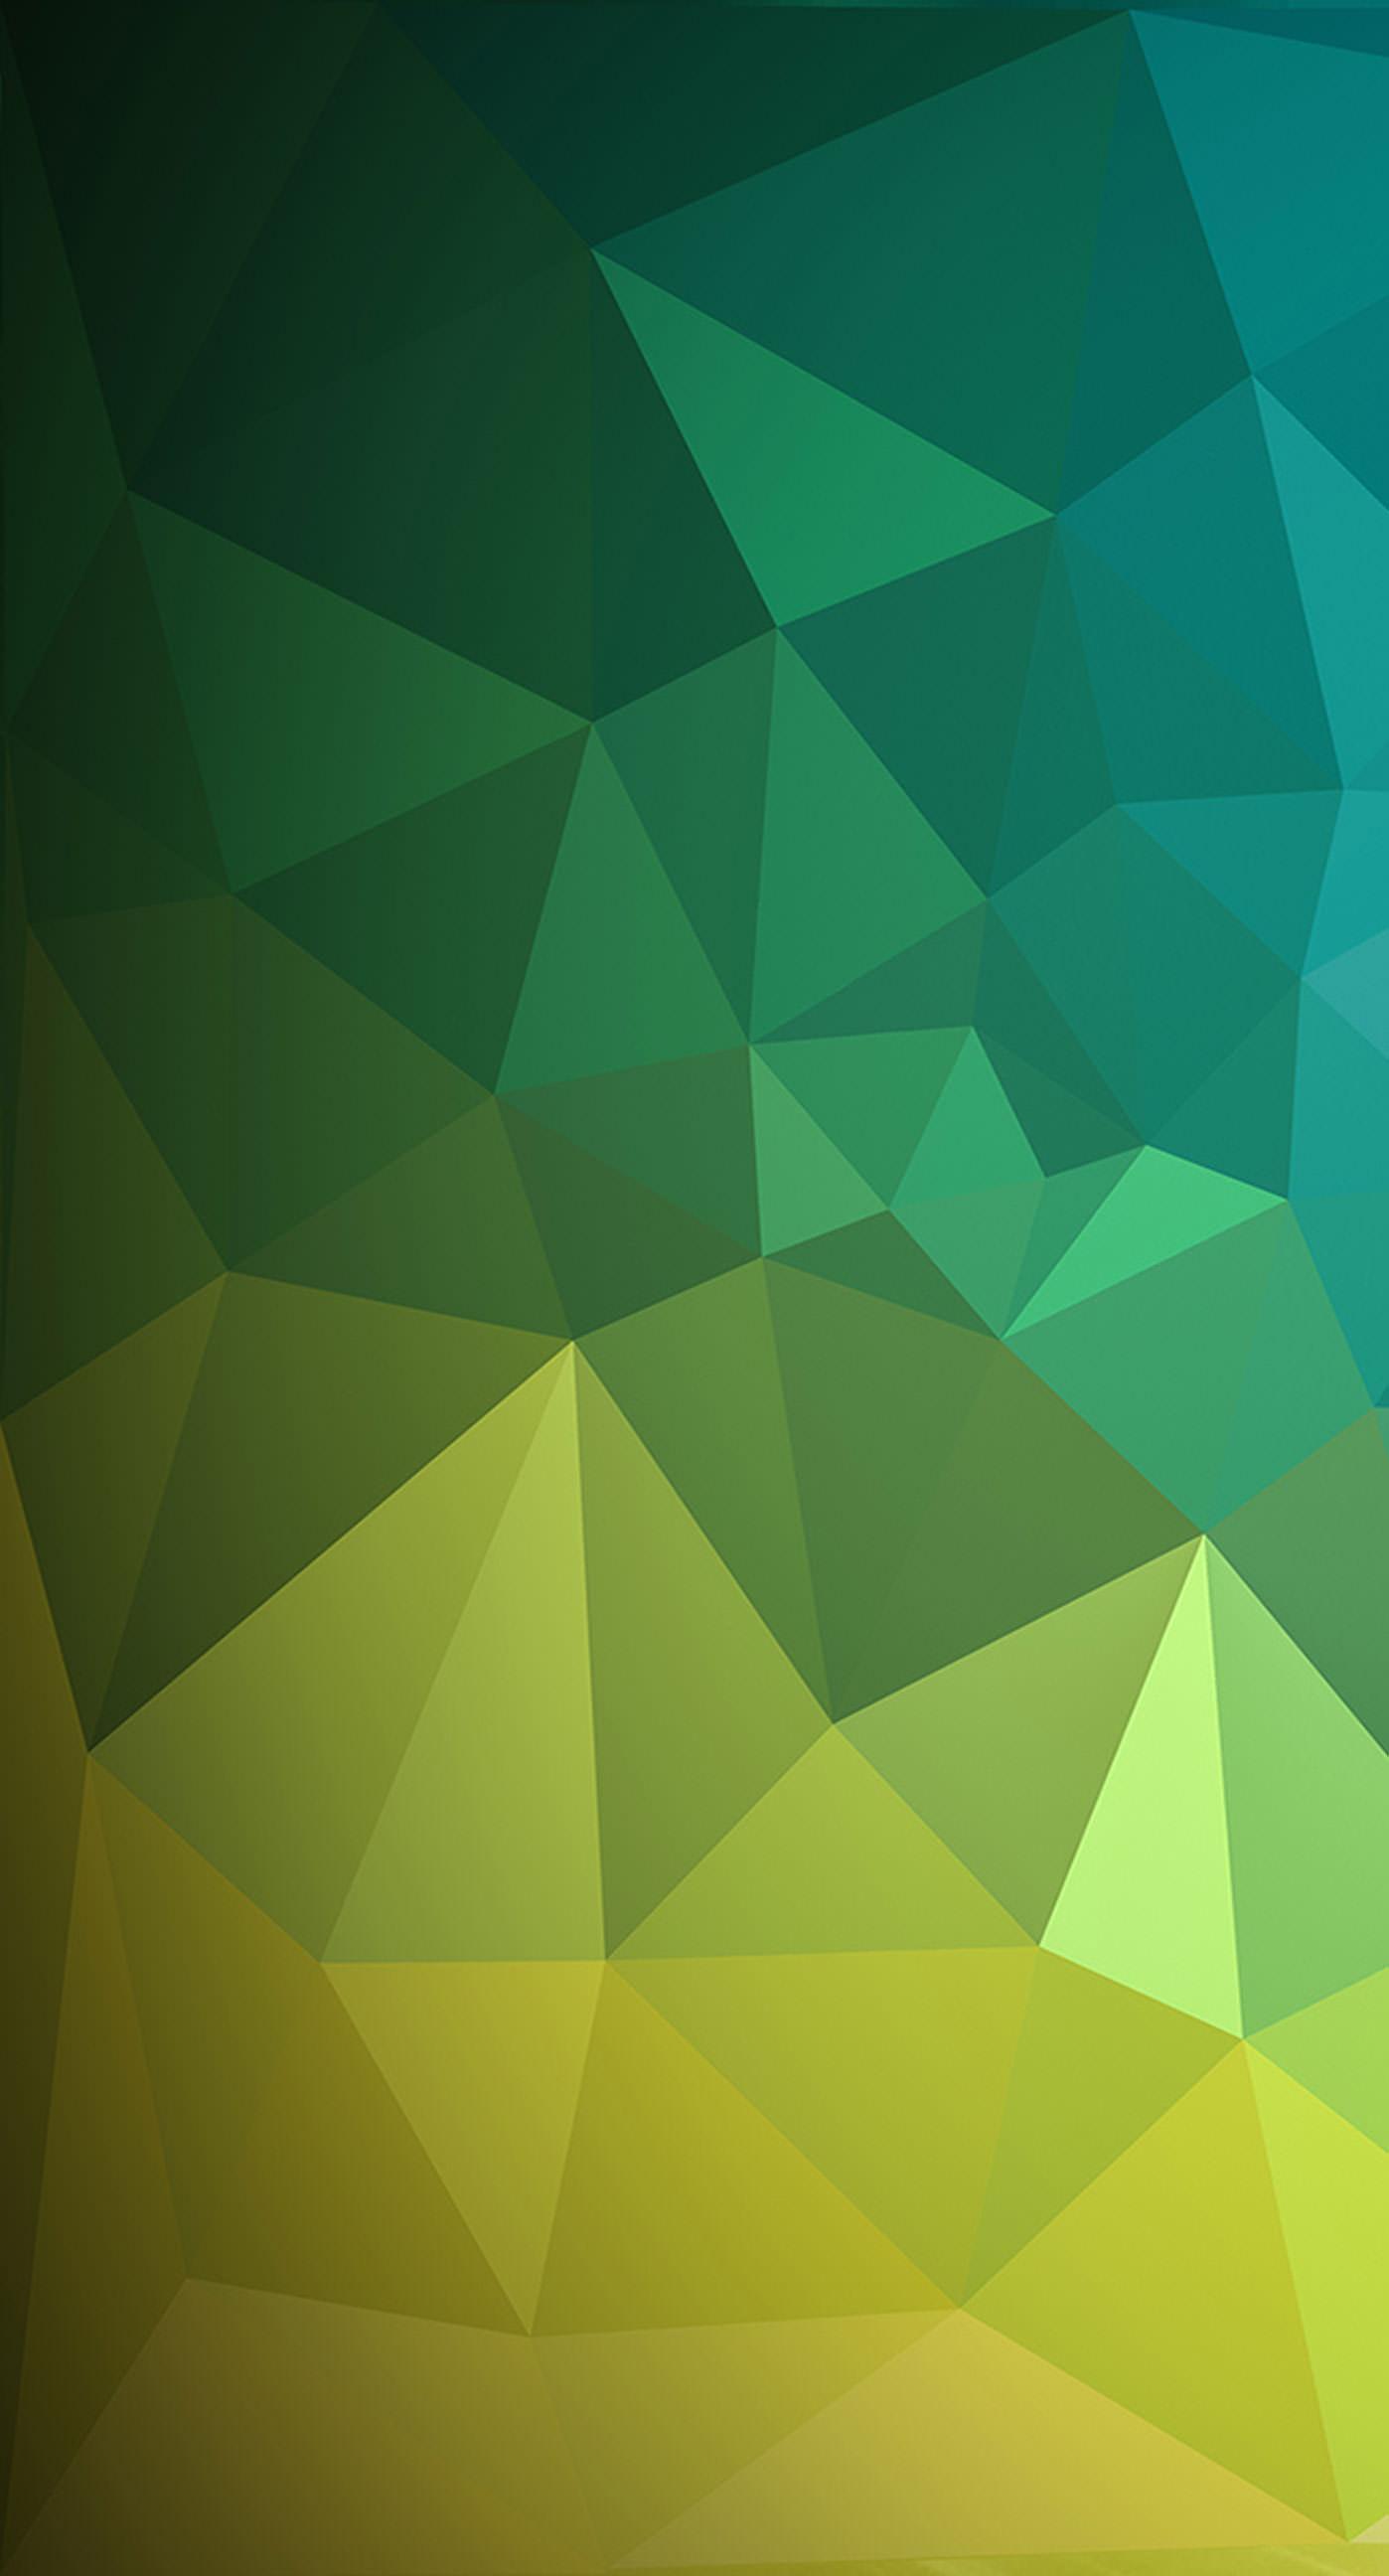 Wallpaper iphone kuning - Pattern Green Yellow Cool Iphone7 Plus Wallpaper